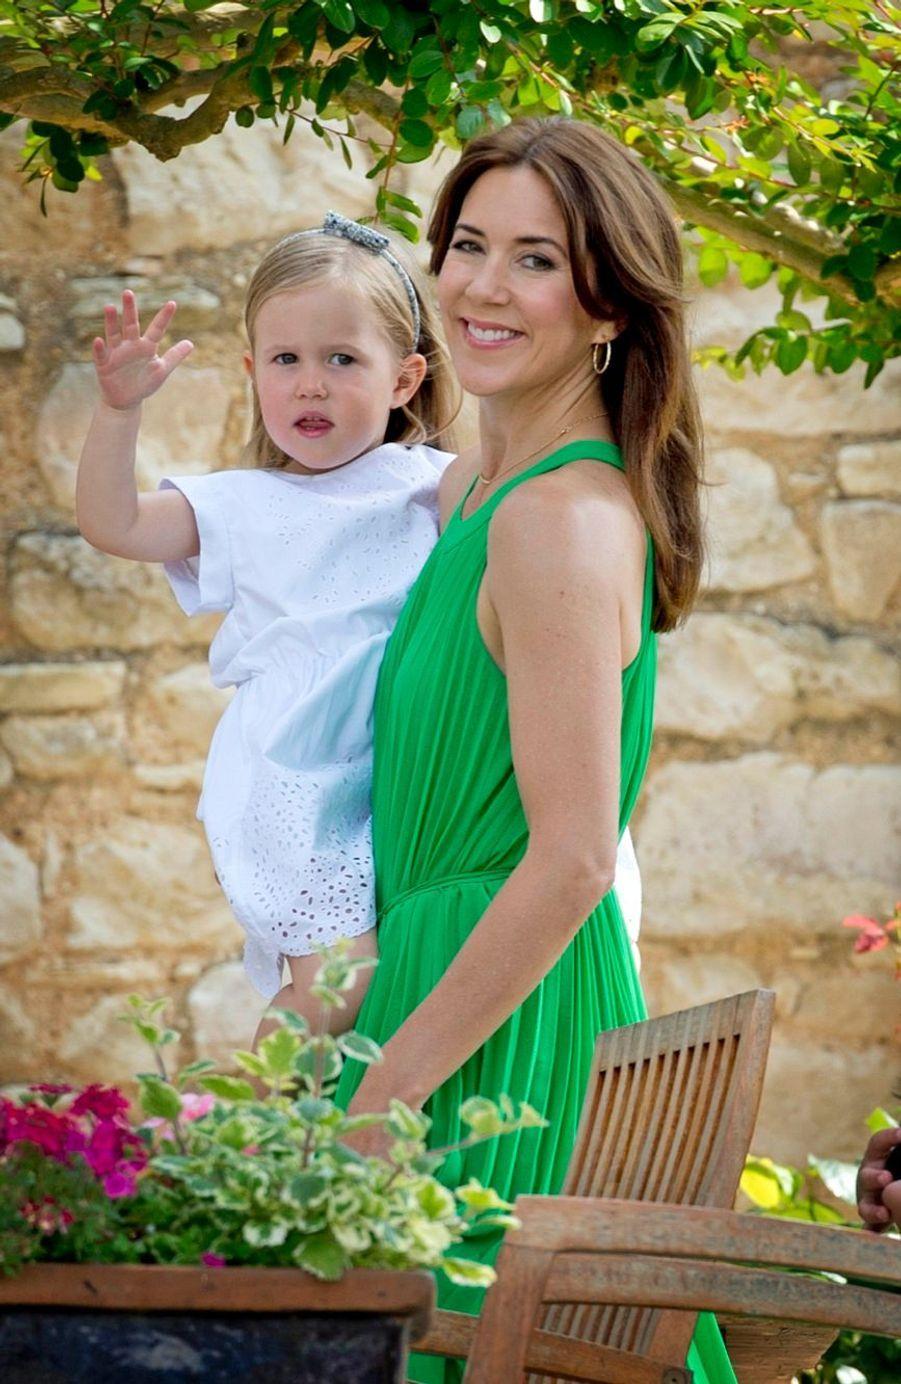 La princesse Joséphine en juin 2014